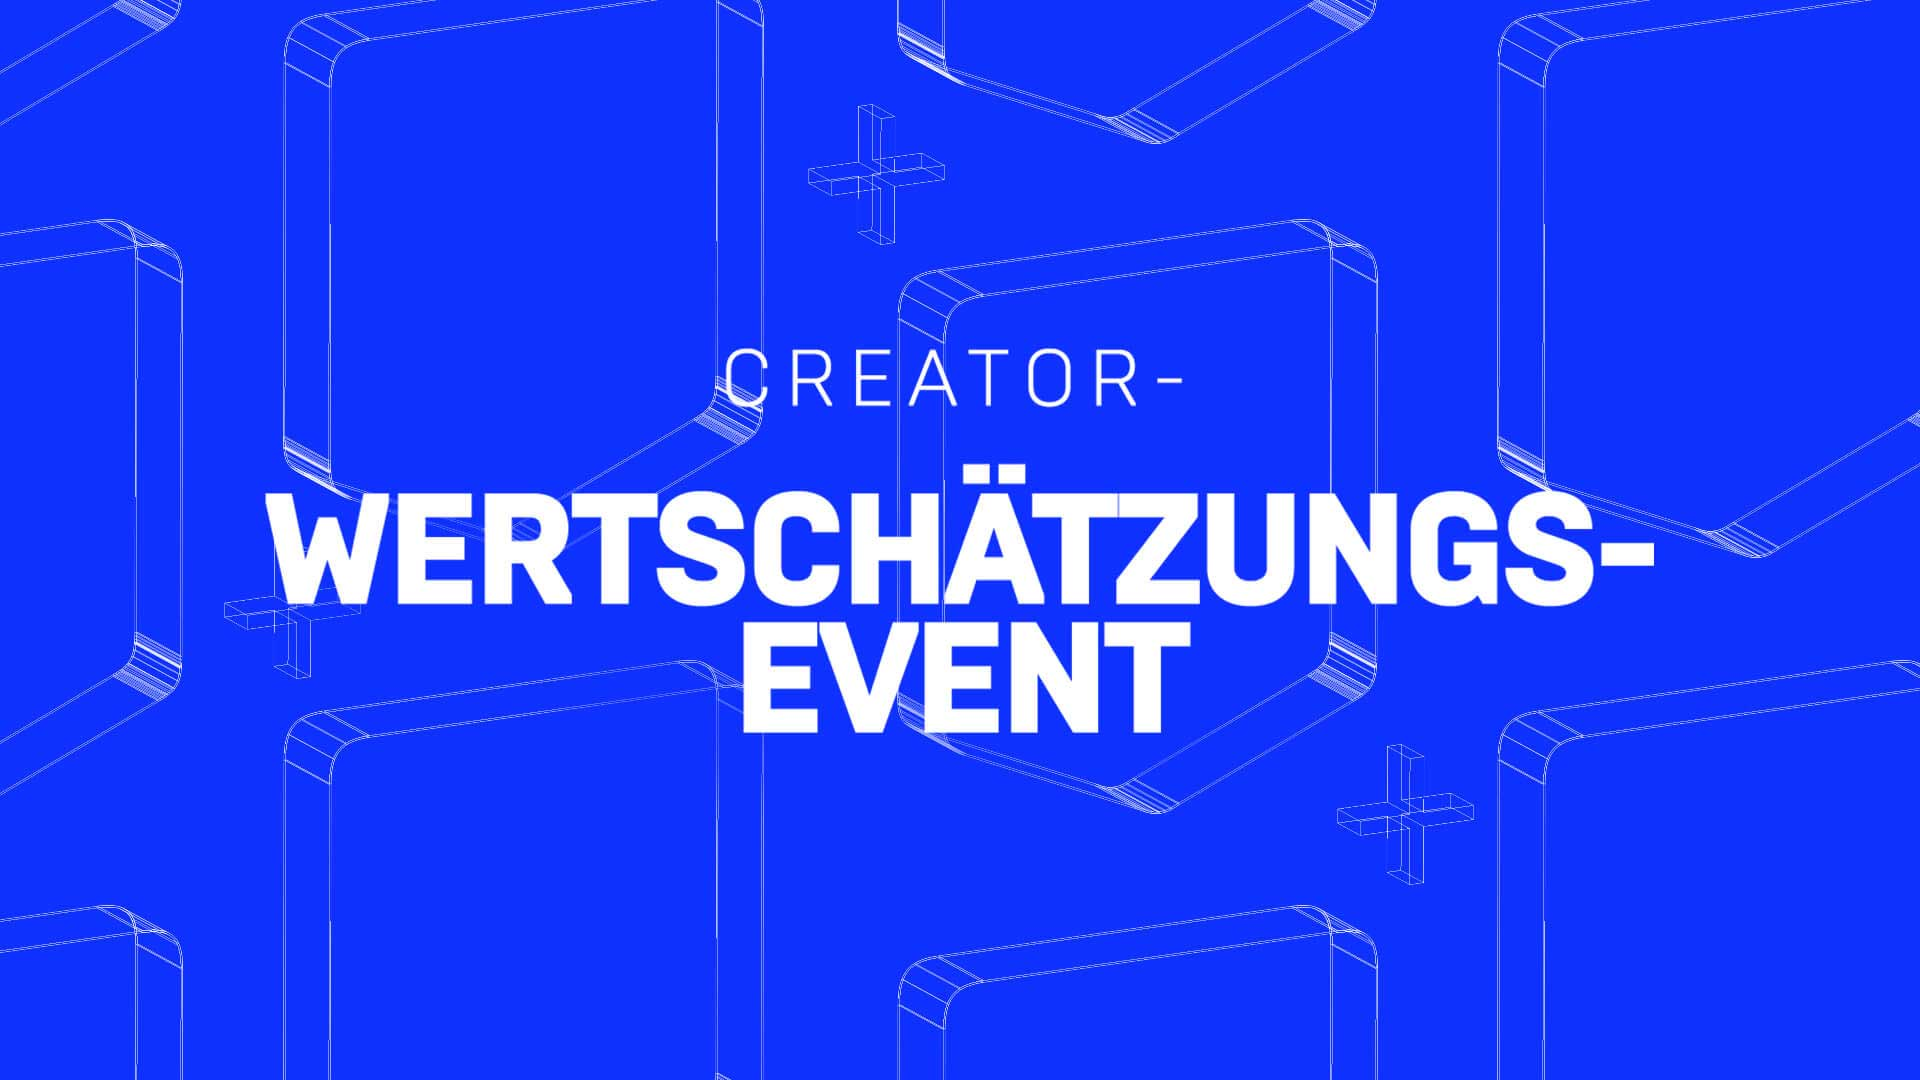 epic creator wertschaetzungs event